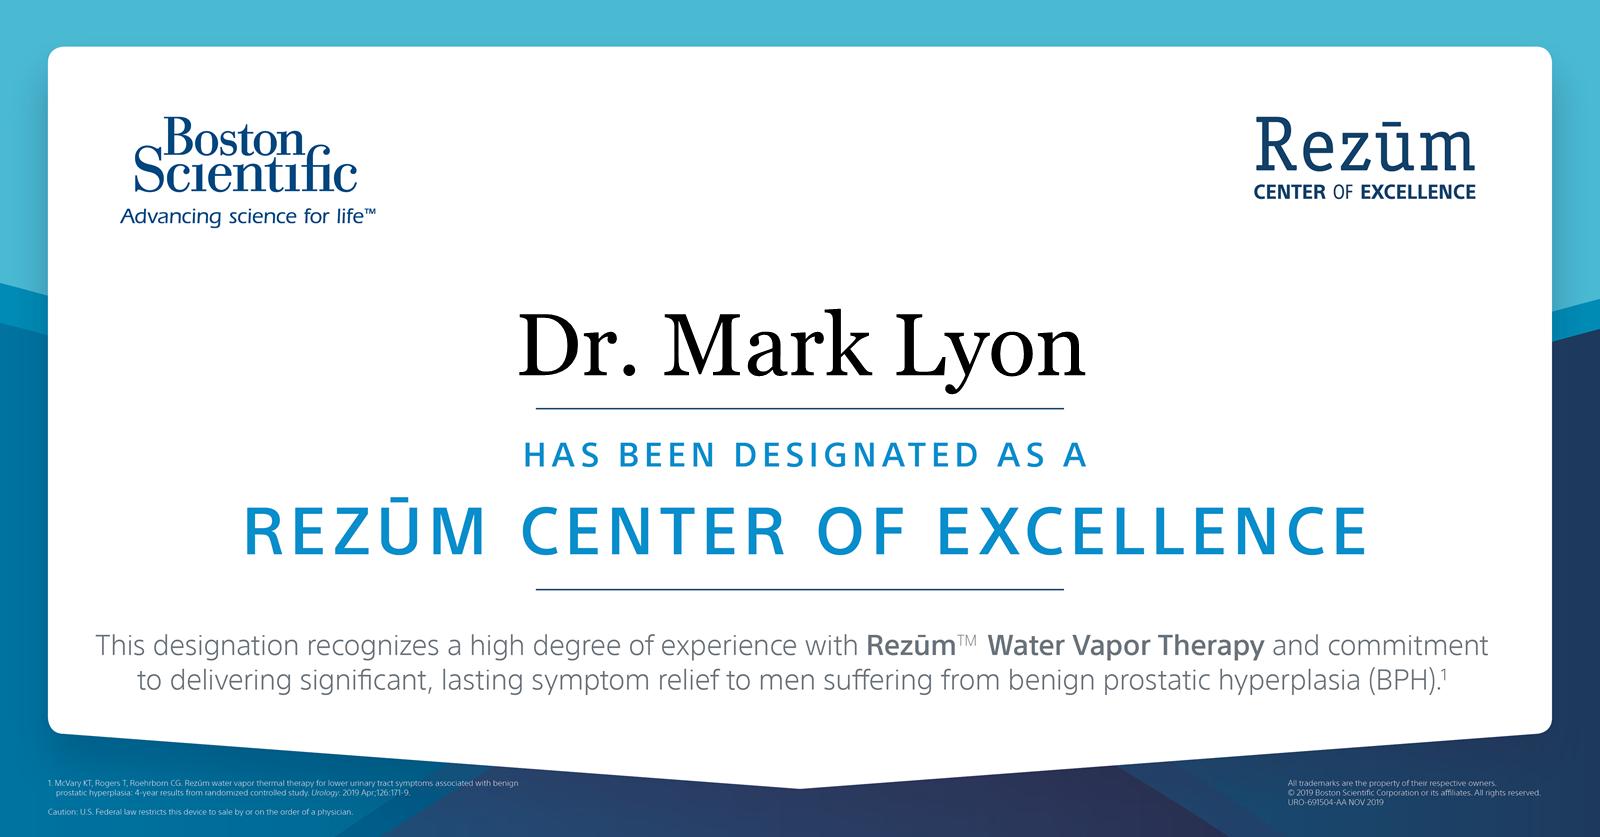 Rezum Center of Excellence - Dr. Mark Lyon